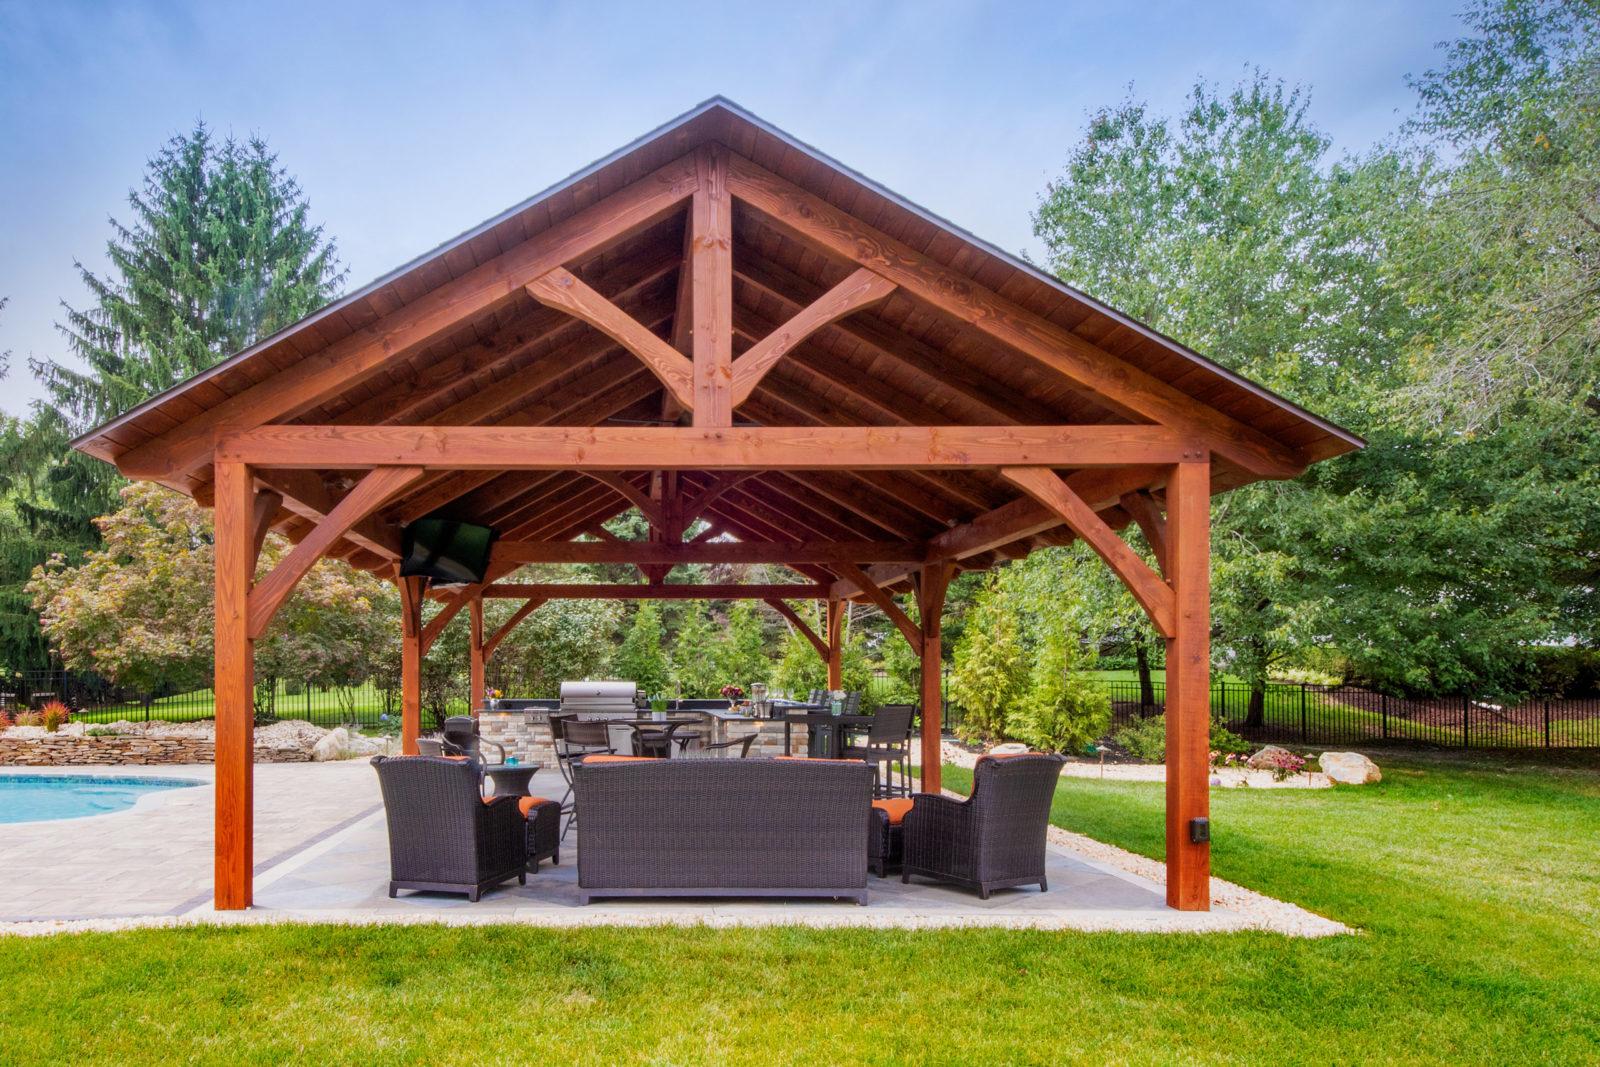 timber frame large pavilion provides visual interest